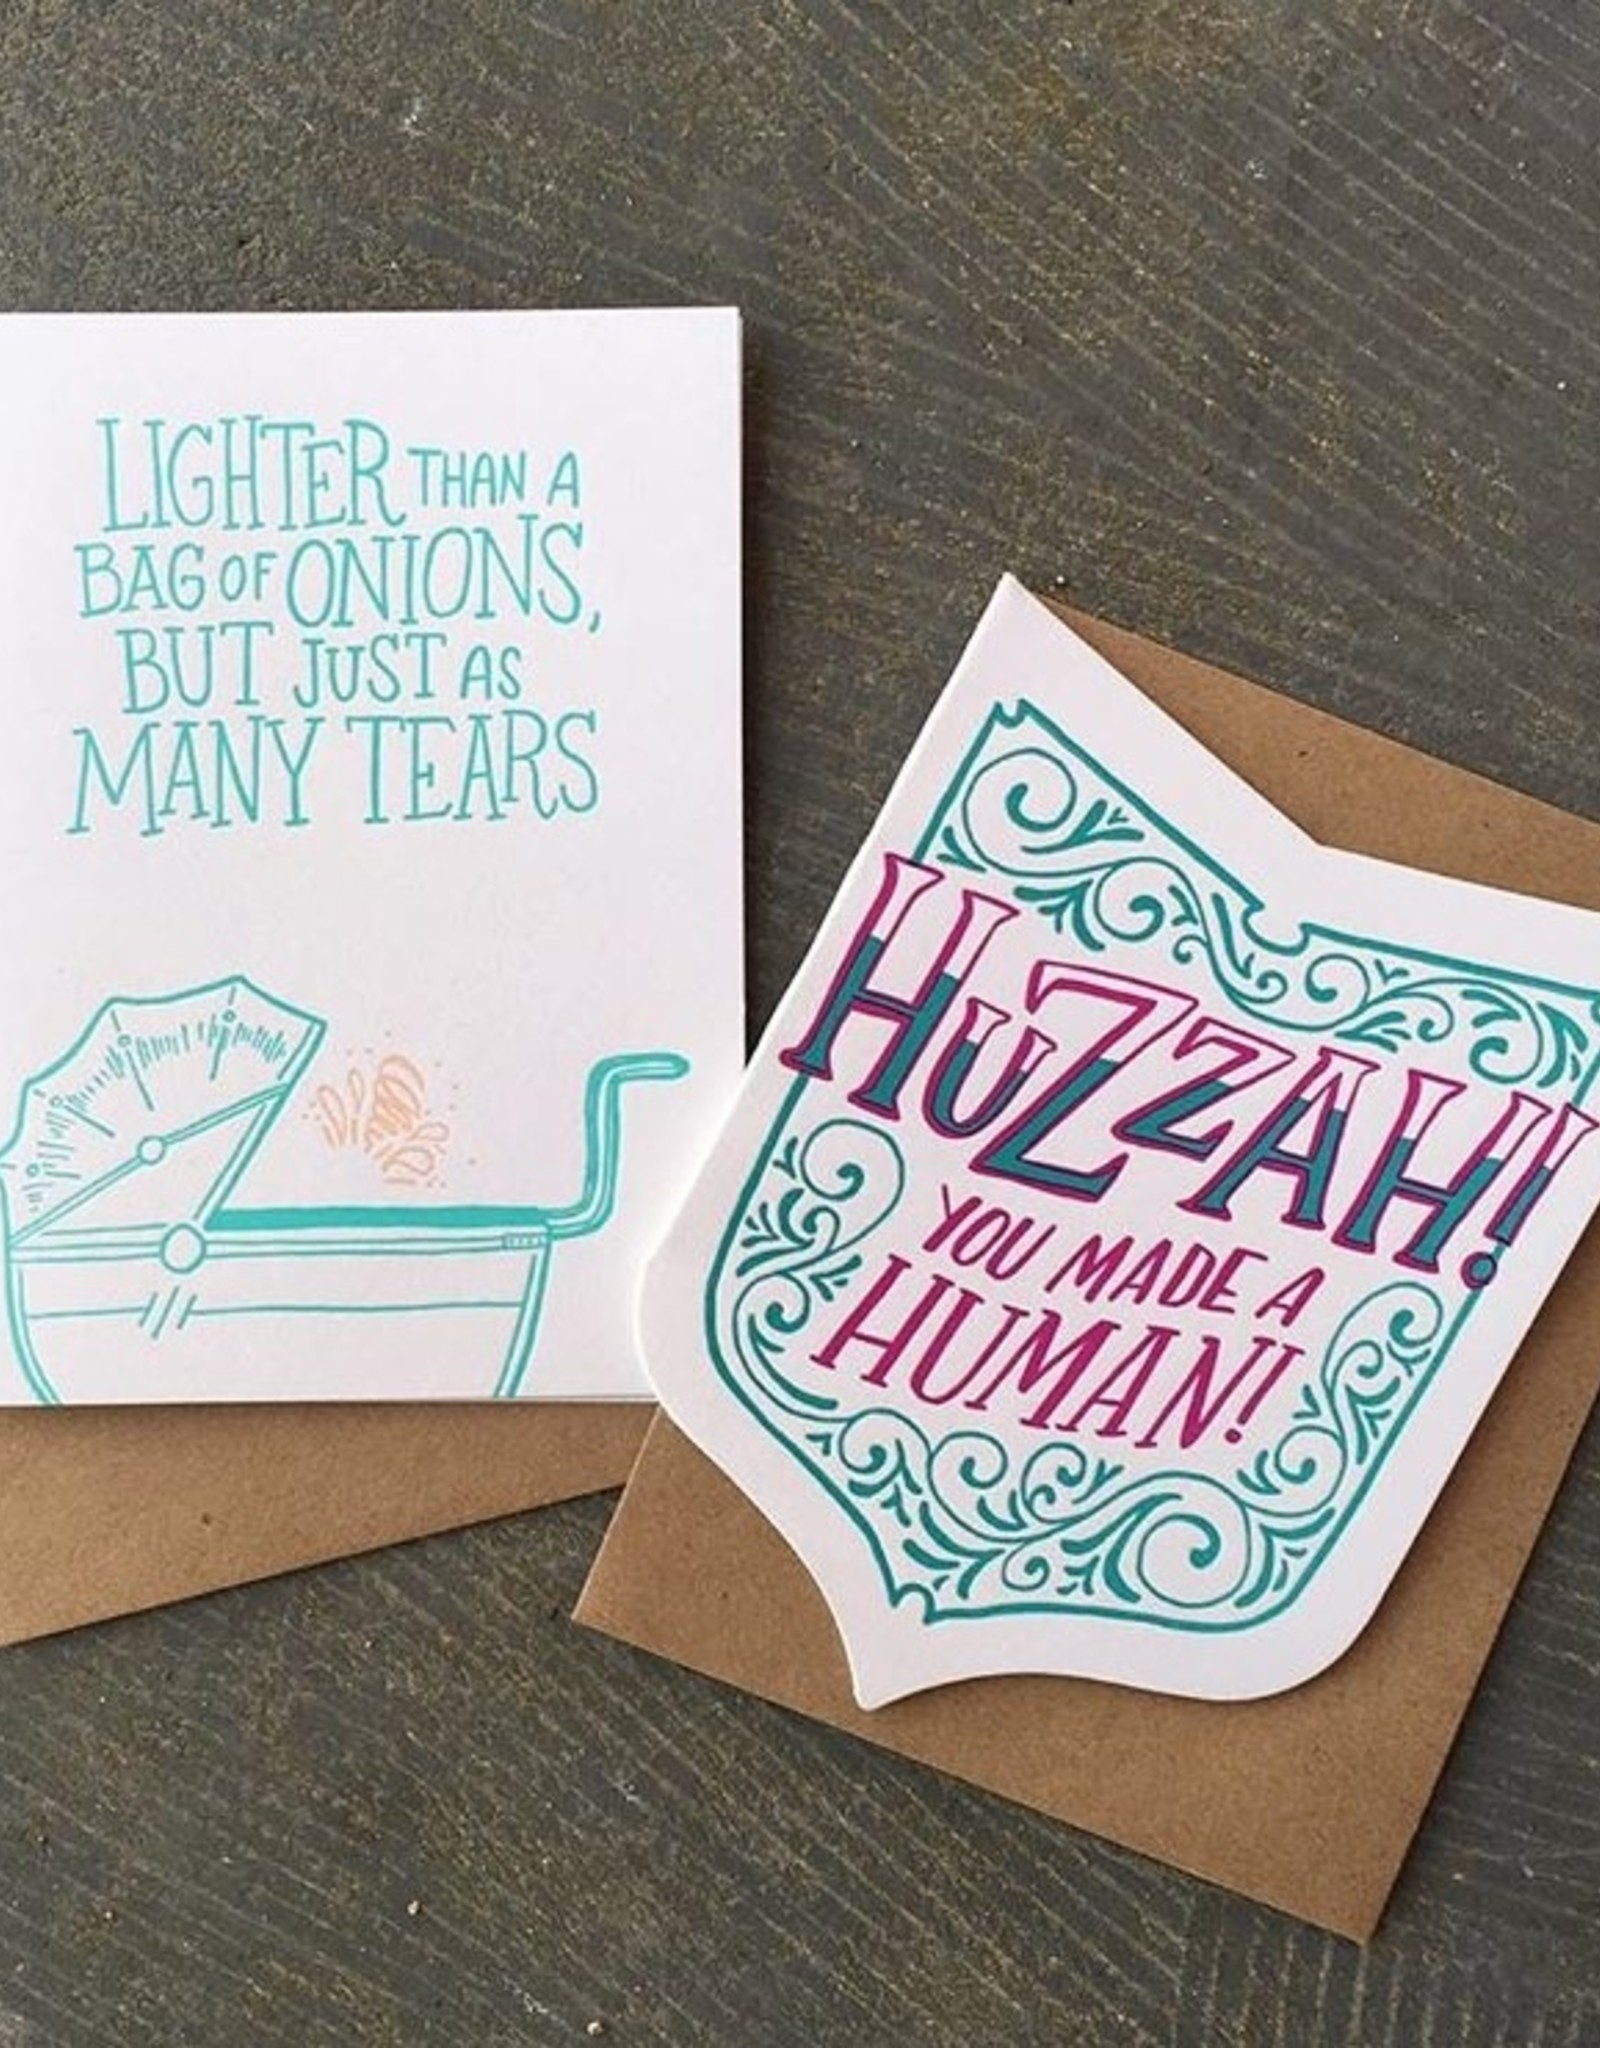 Frog & Toad Press Huzzah You Made a Human! Greeting Card